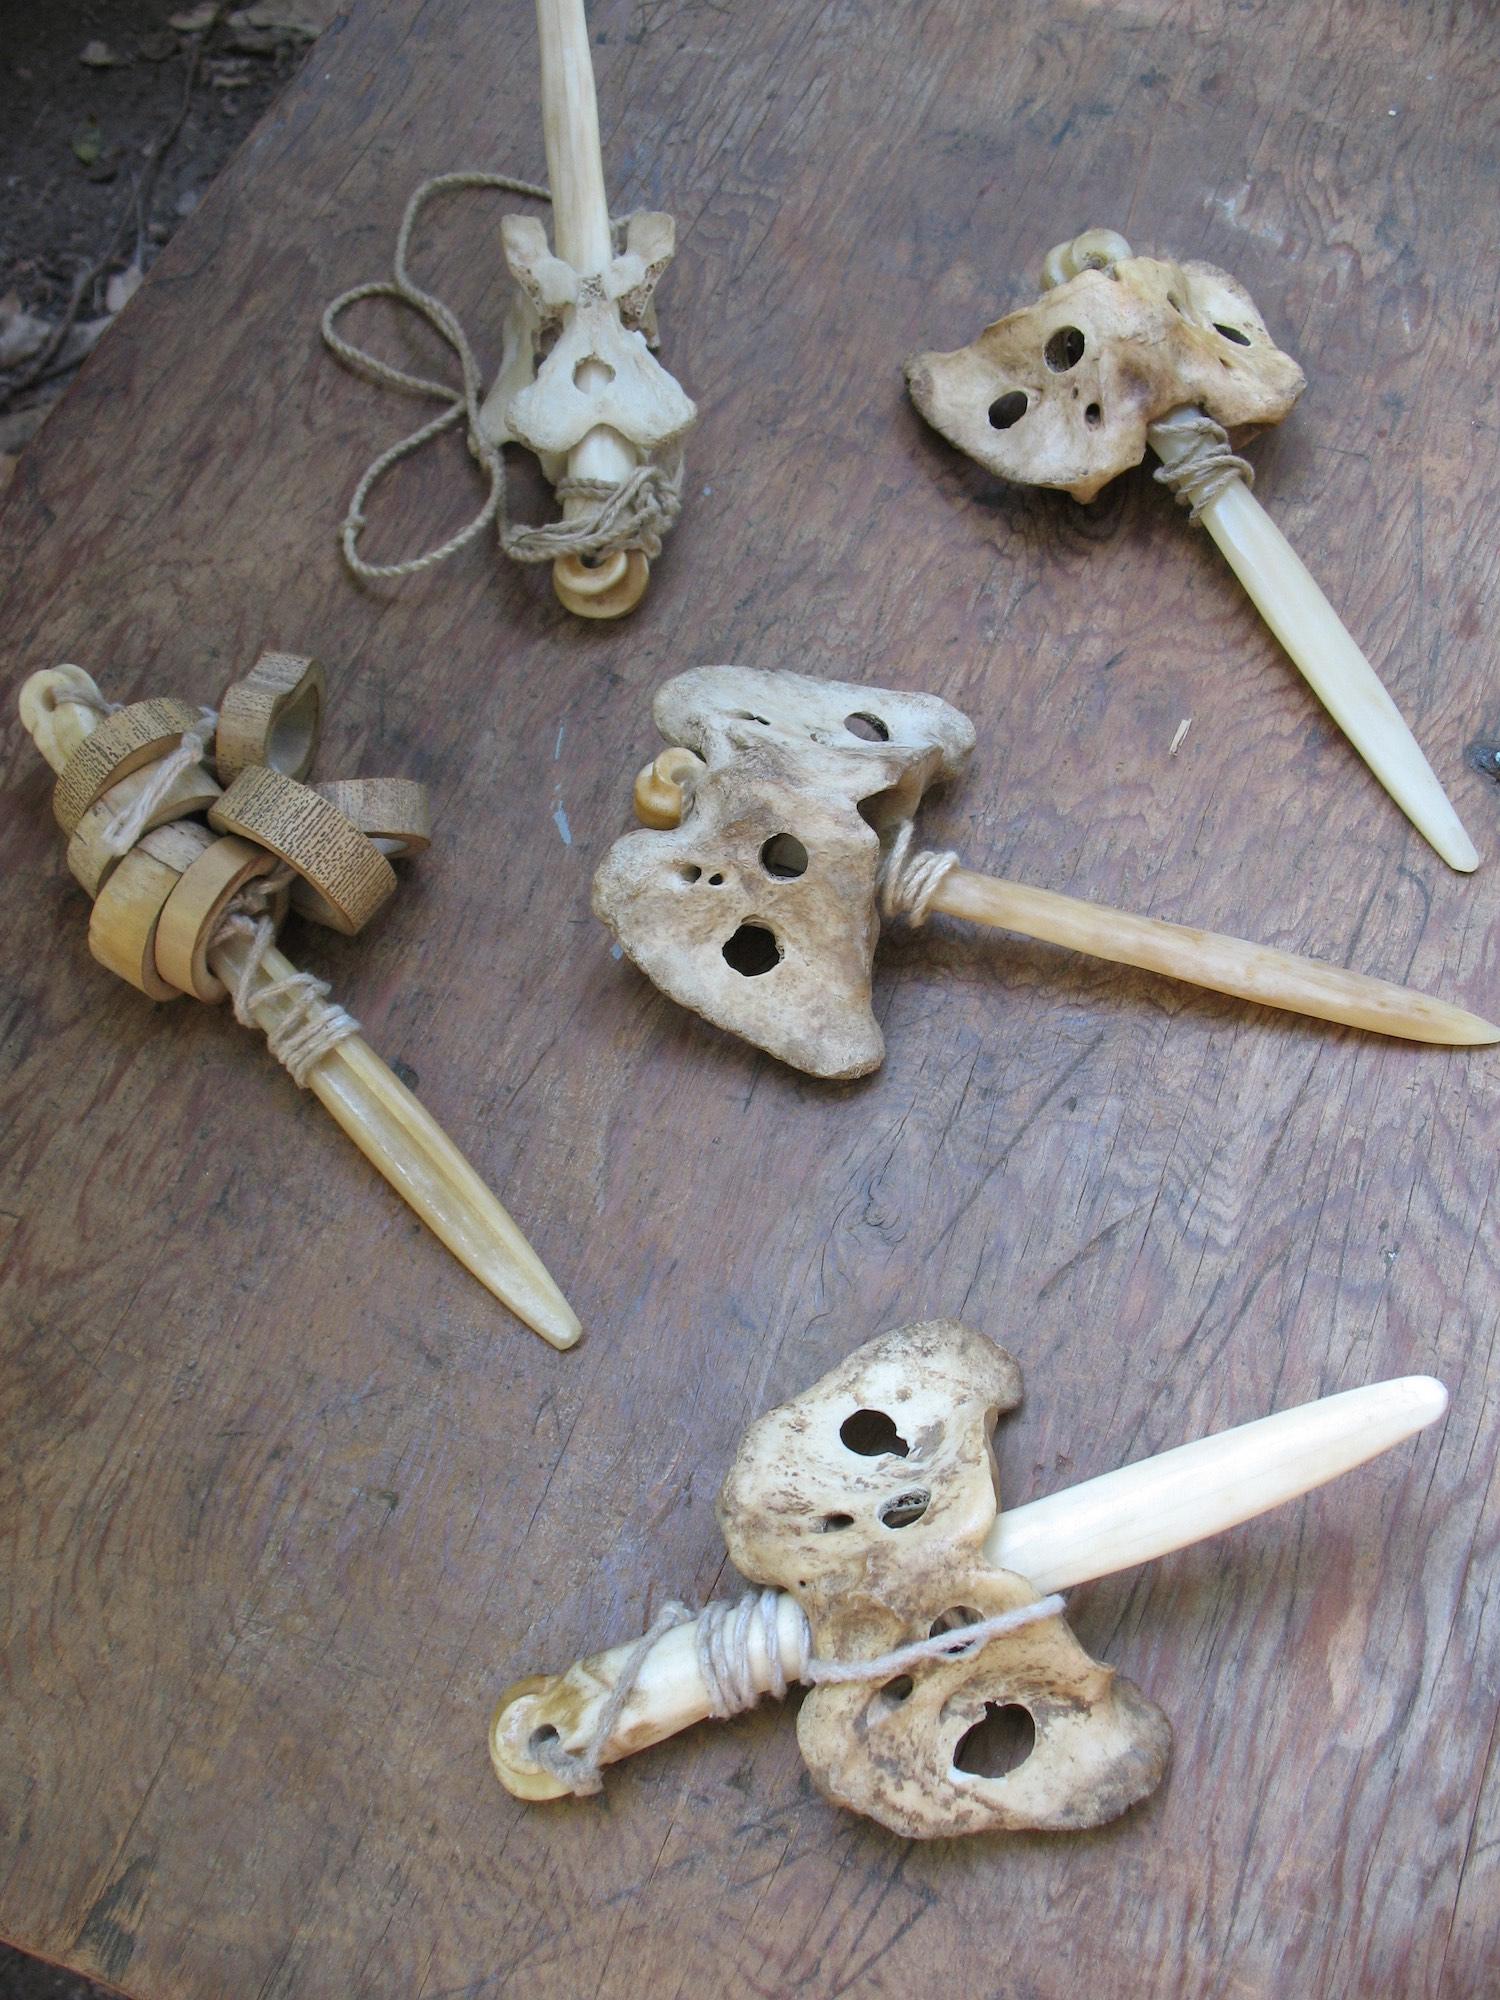 Catch games made from deer cannon bones, atlas bones & string